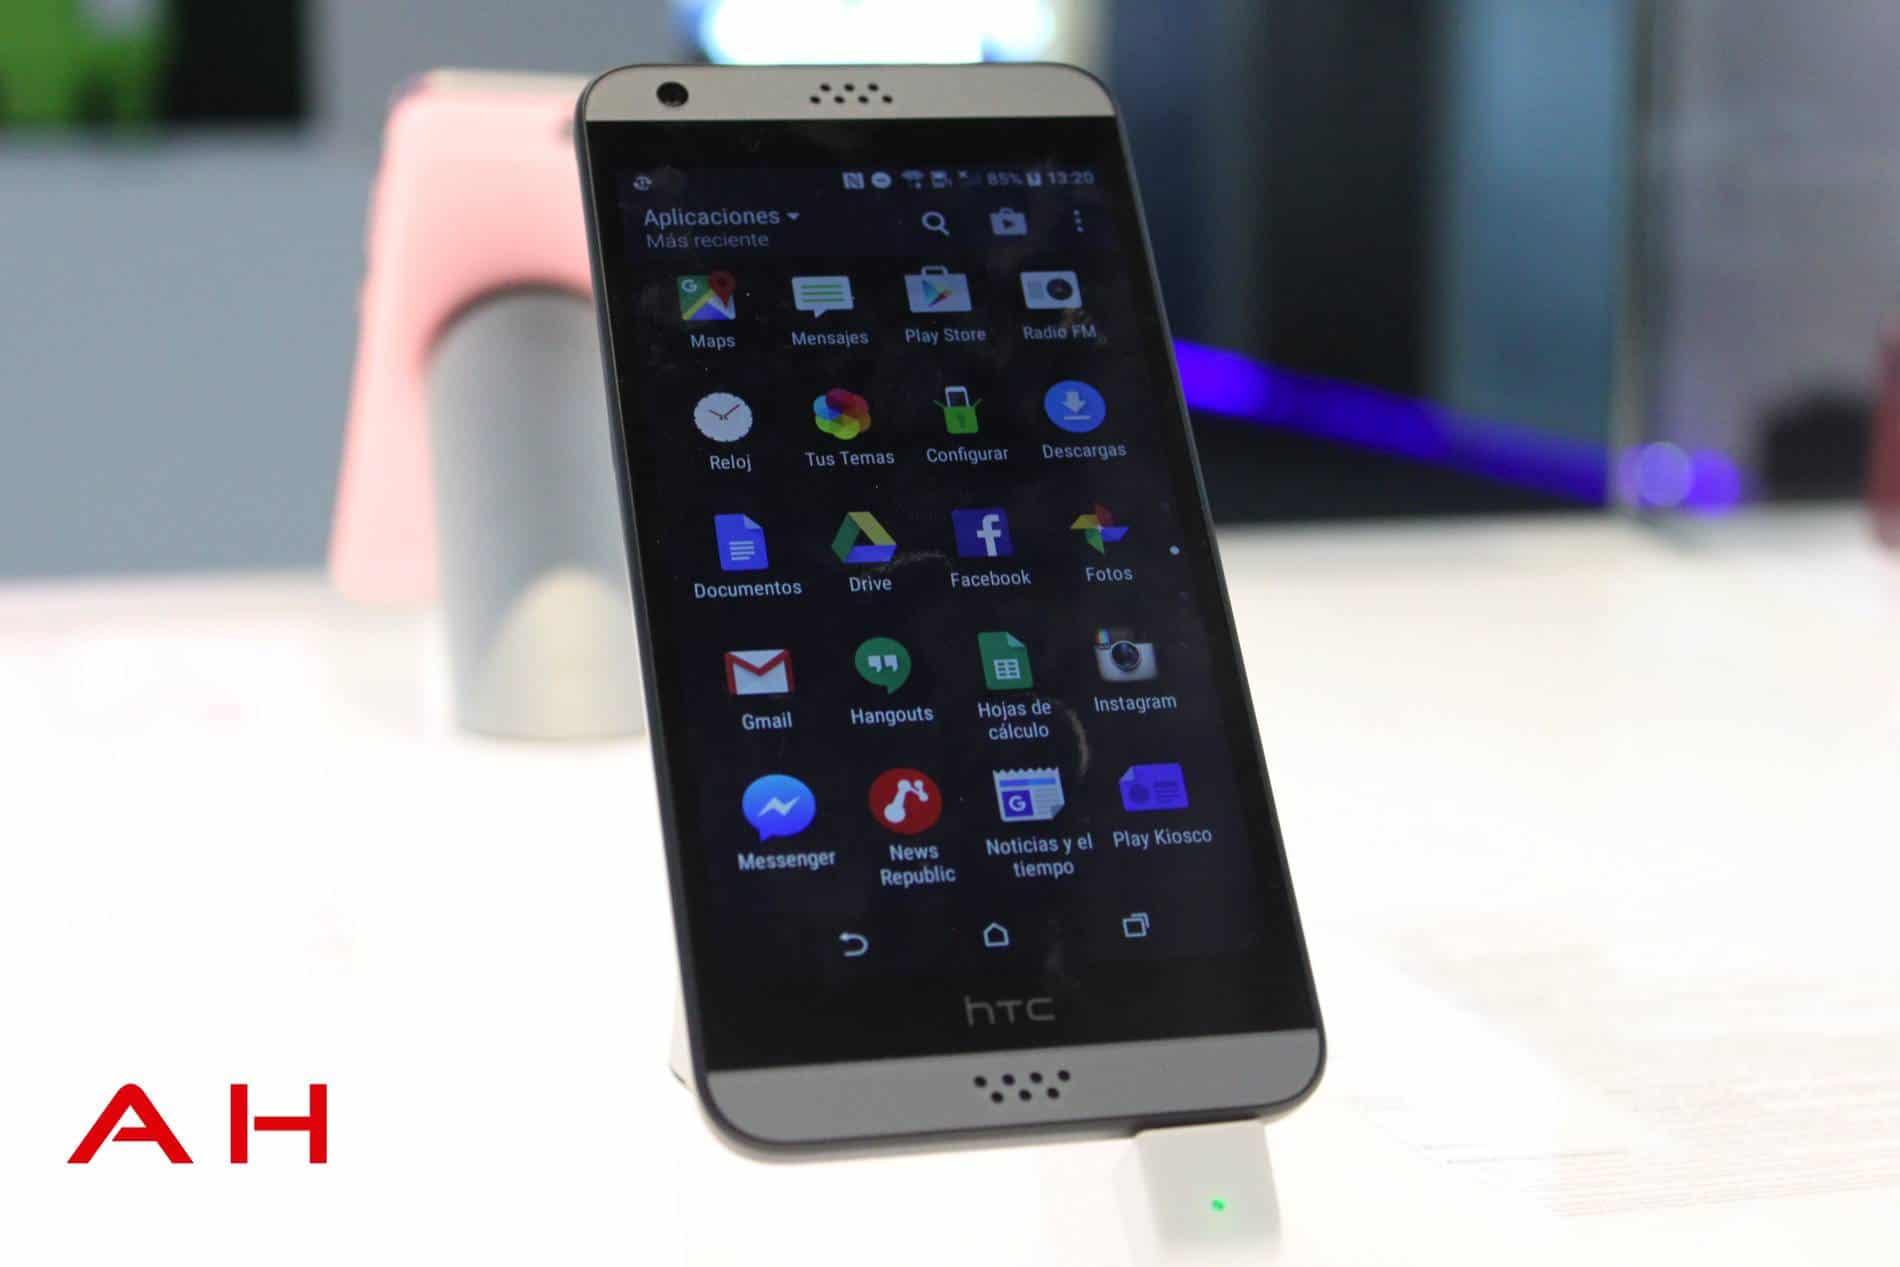 HTC Desire 530 MWC AH 12